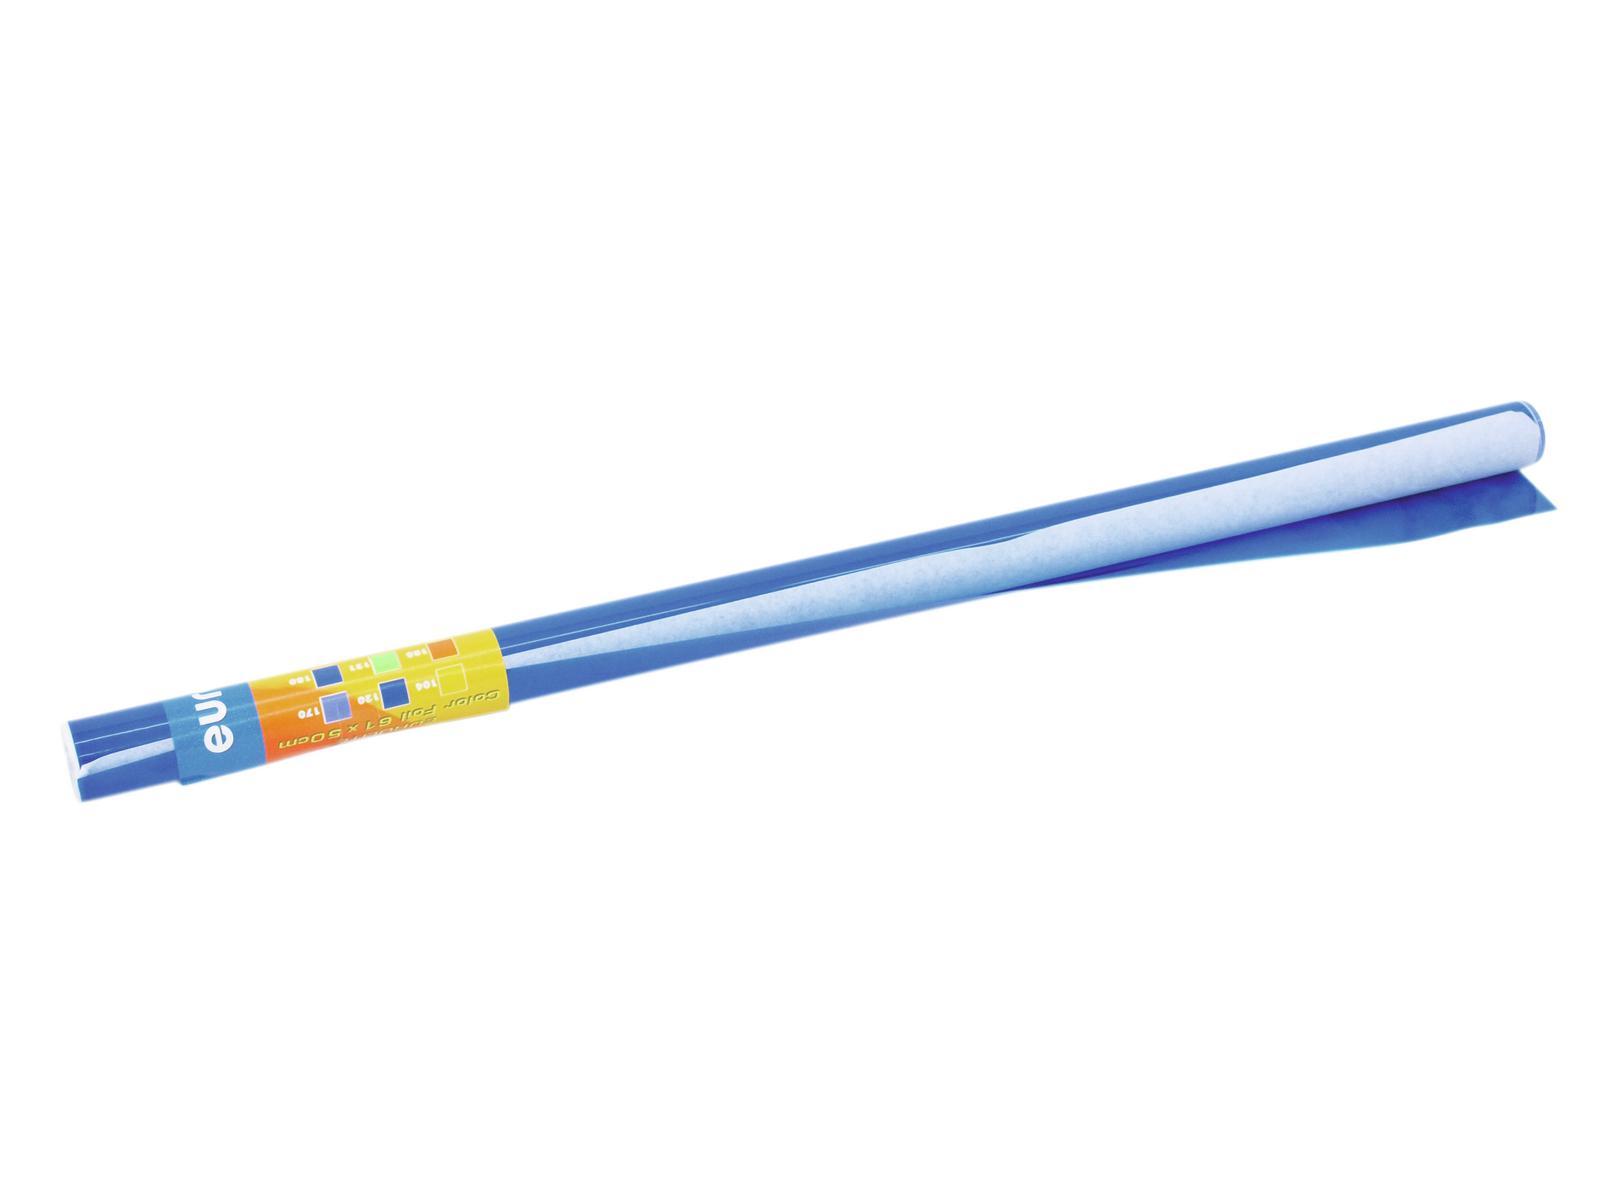 Gelatina Rotolo Filtro Per Tubo neon 161 61x50cm blu ardesia Eurolite